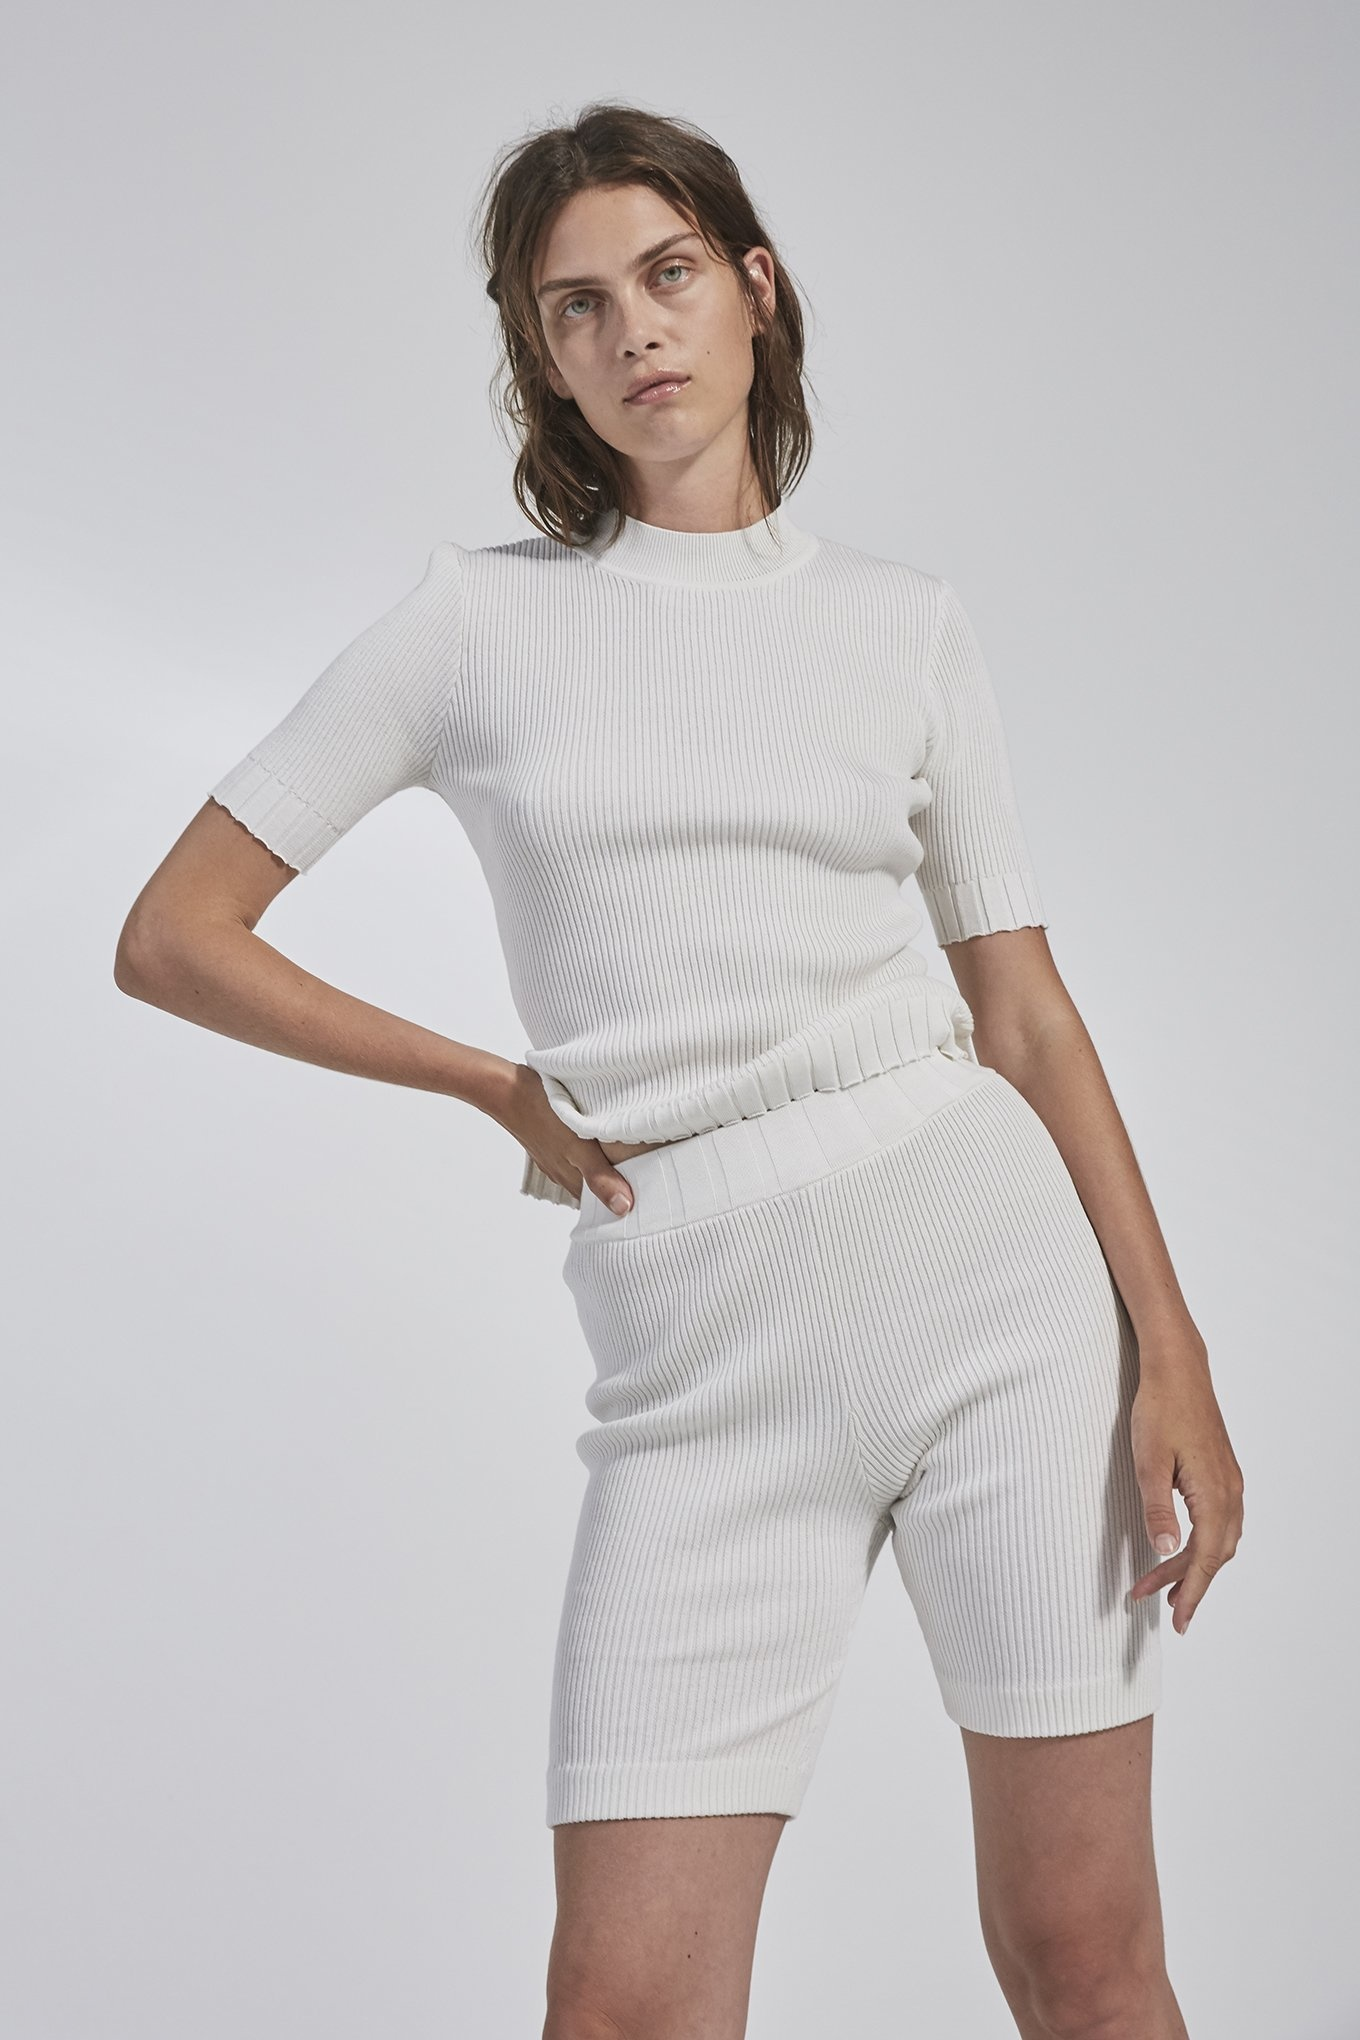 Nixon knit Shorts White